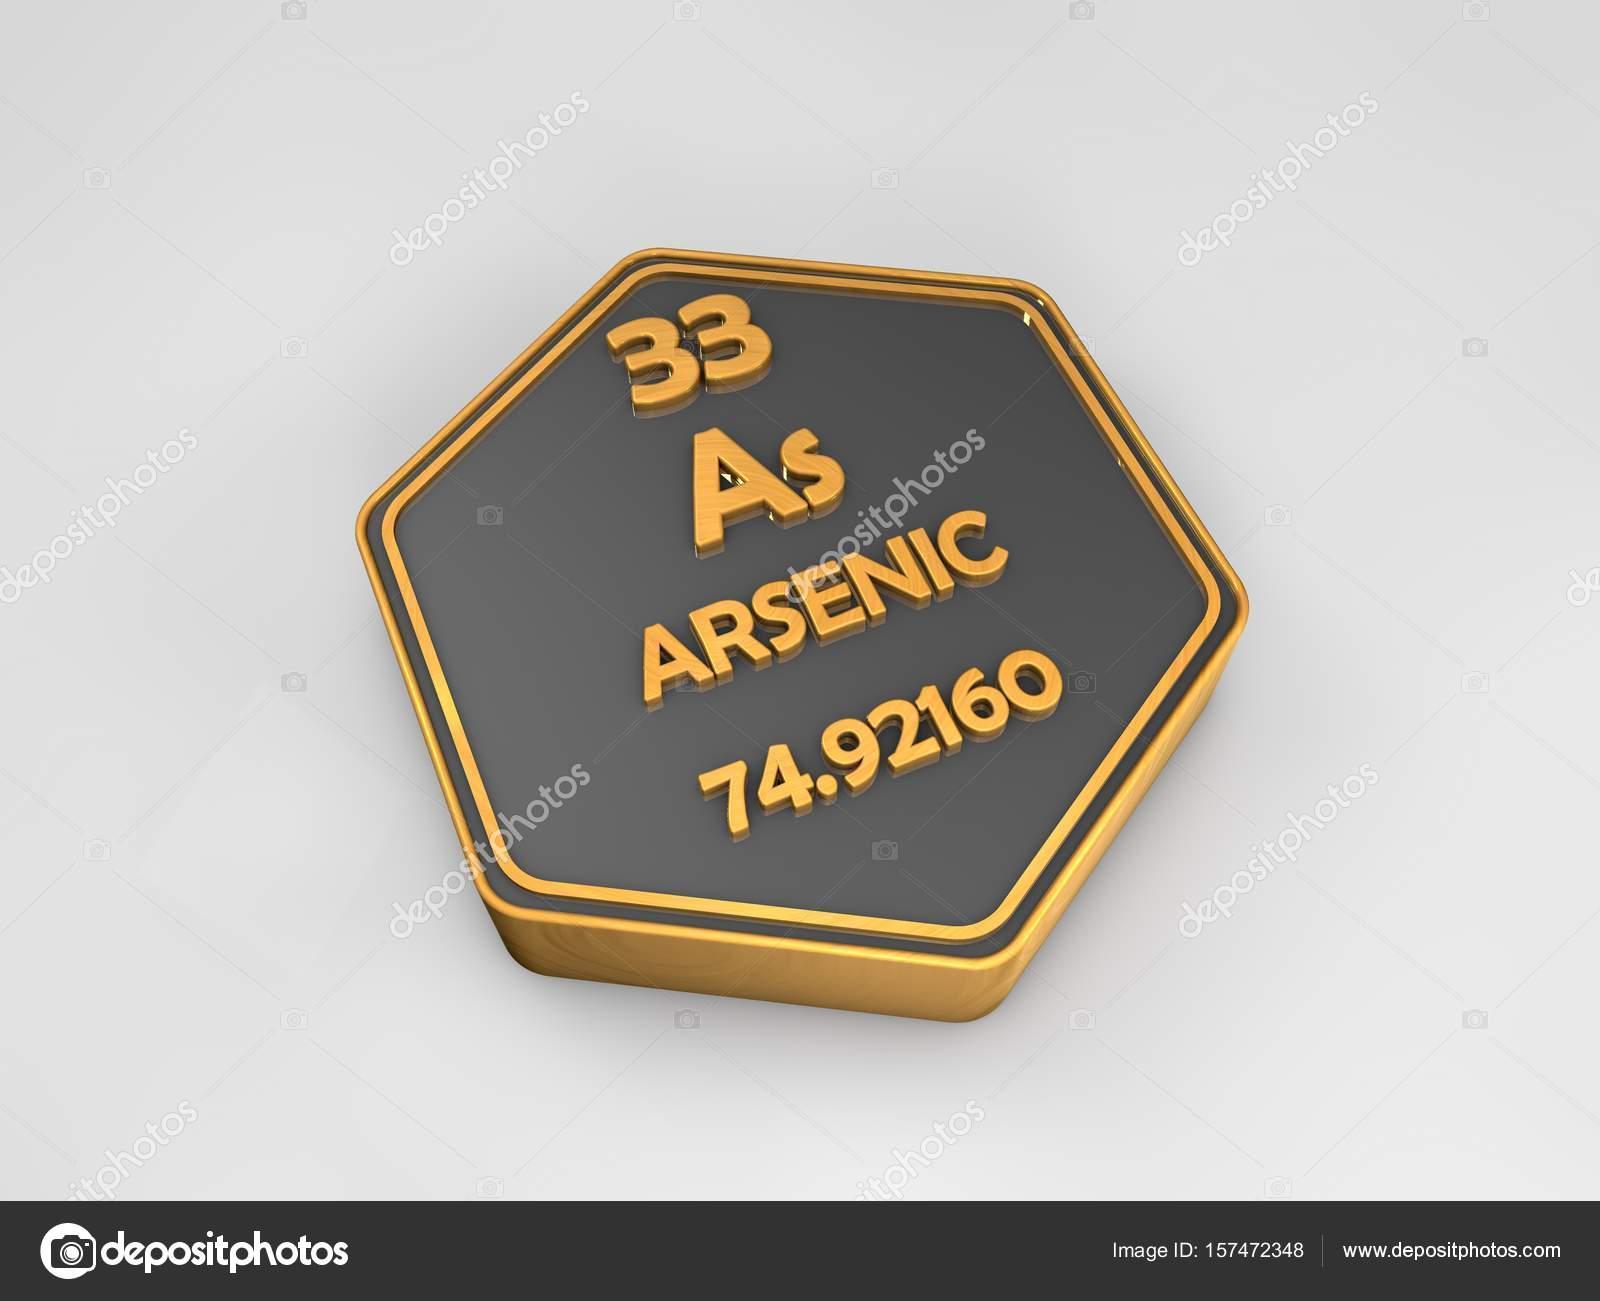 Arsenic Ar Chemical Element Periodic Table Hexagonal Shape 3d